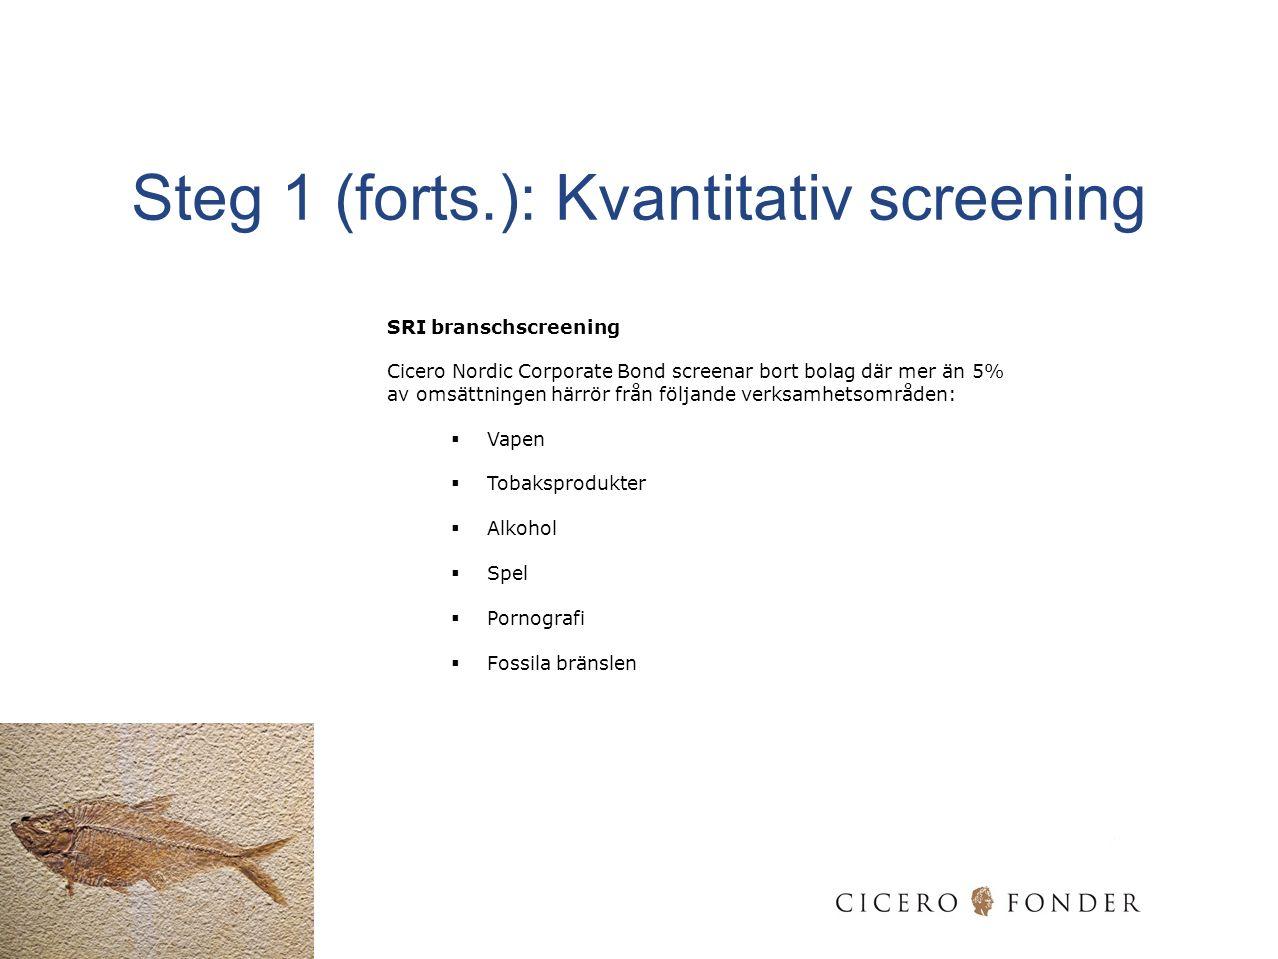 Steg 1 (forts.): Kvantitativ screening